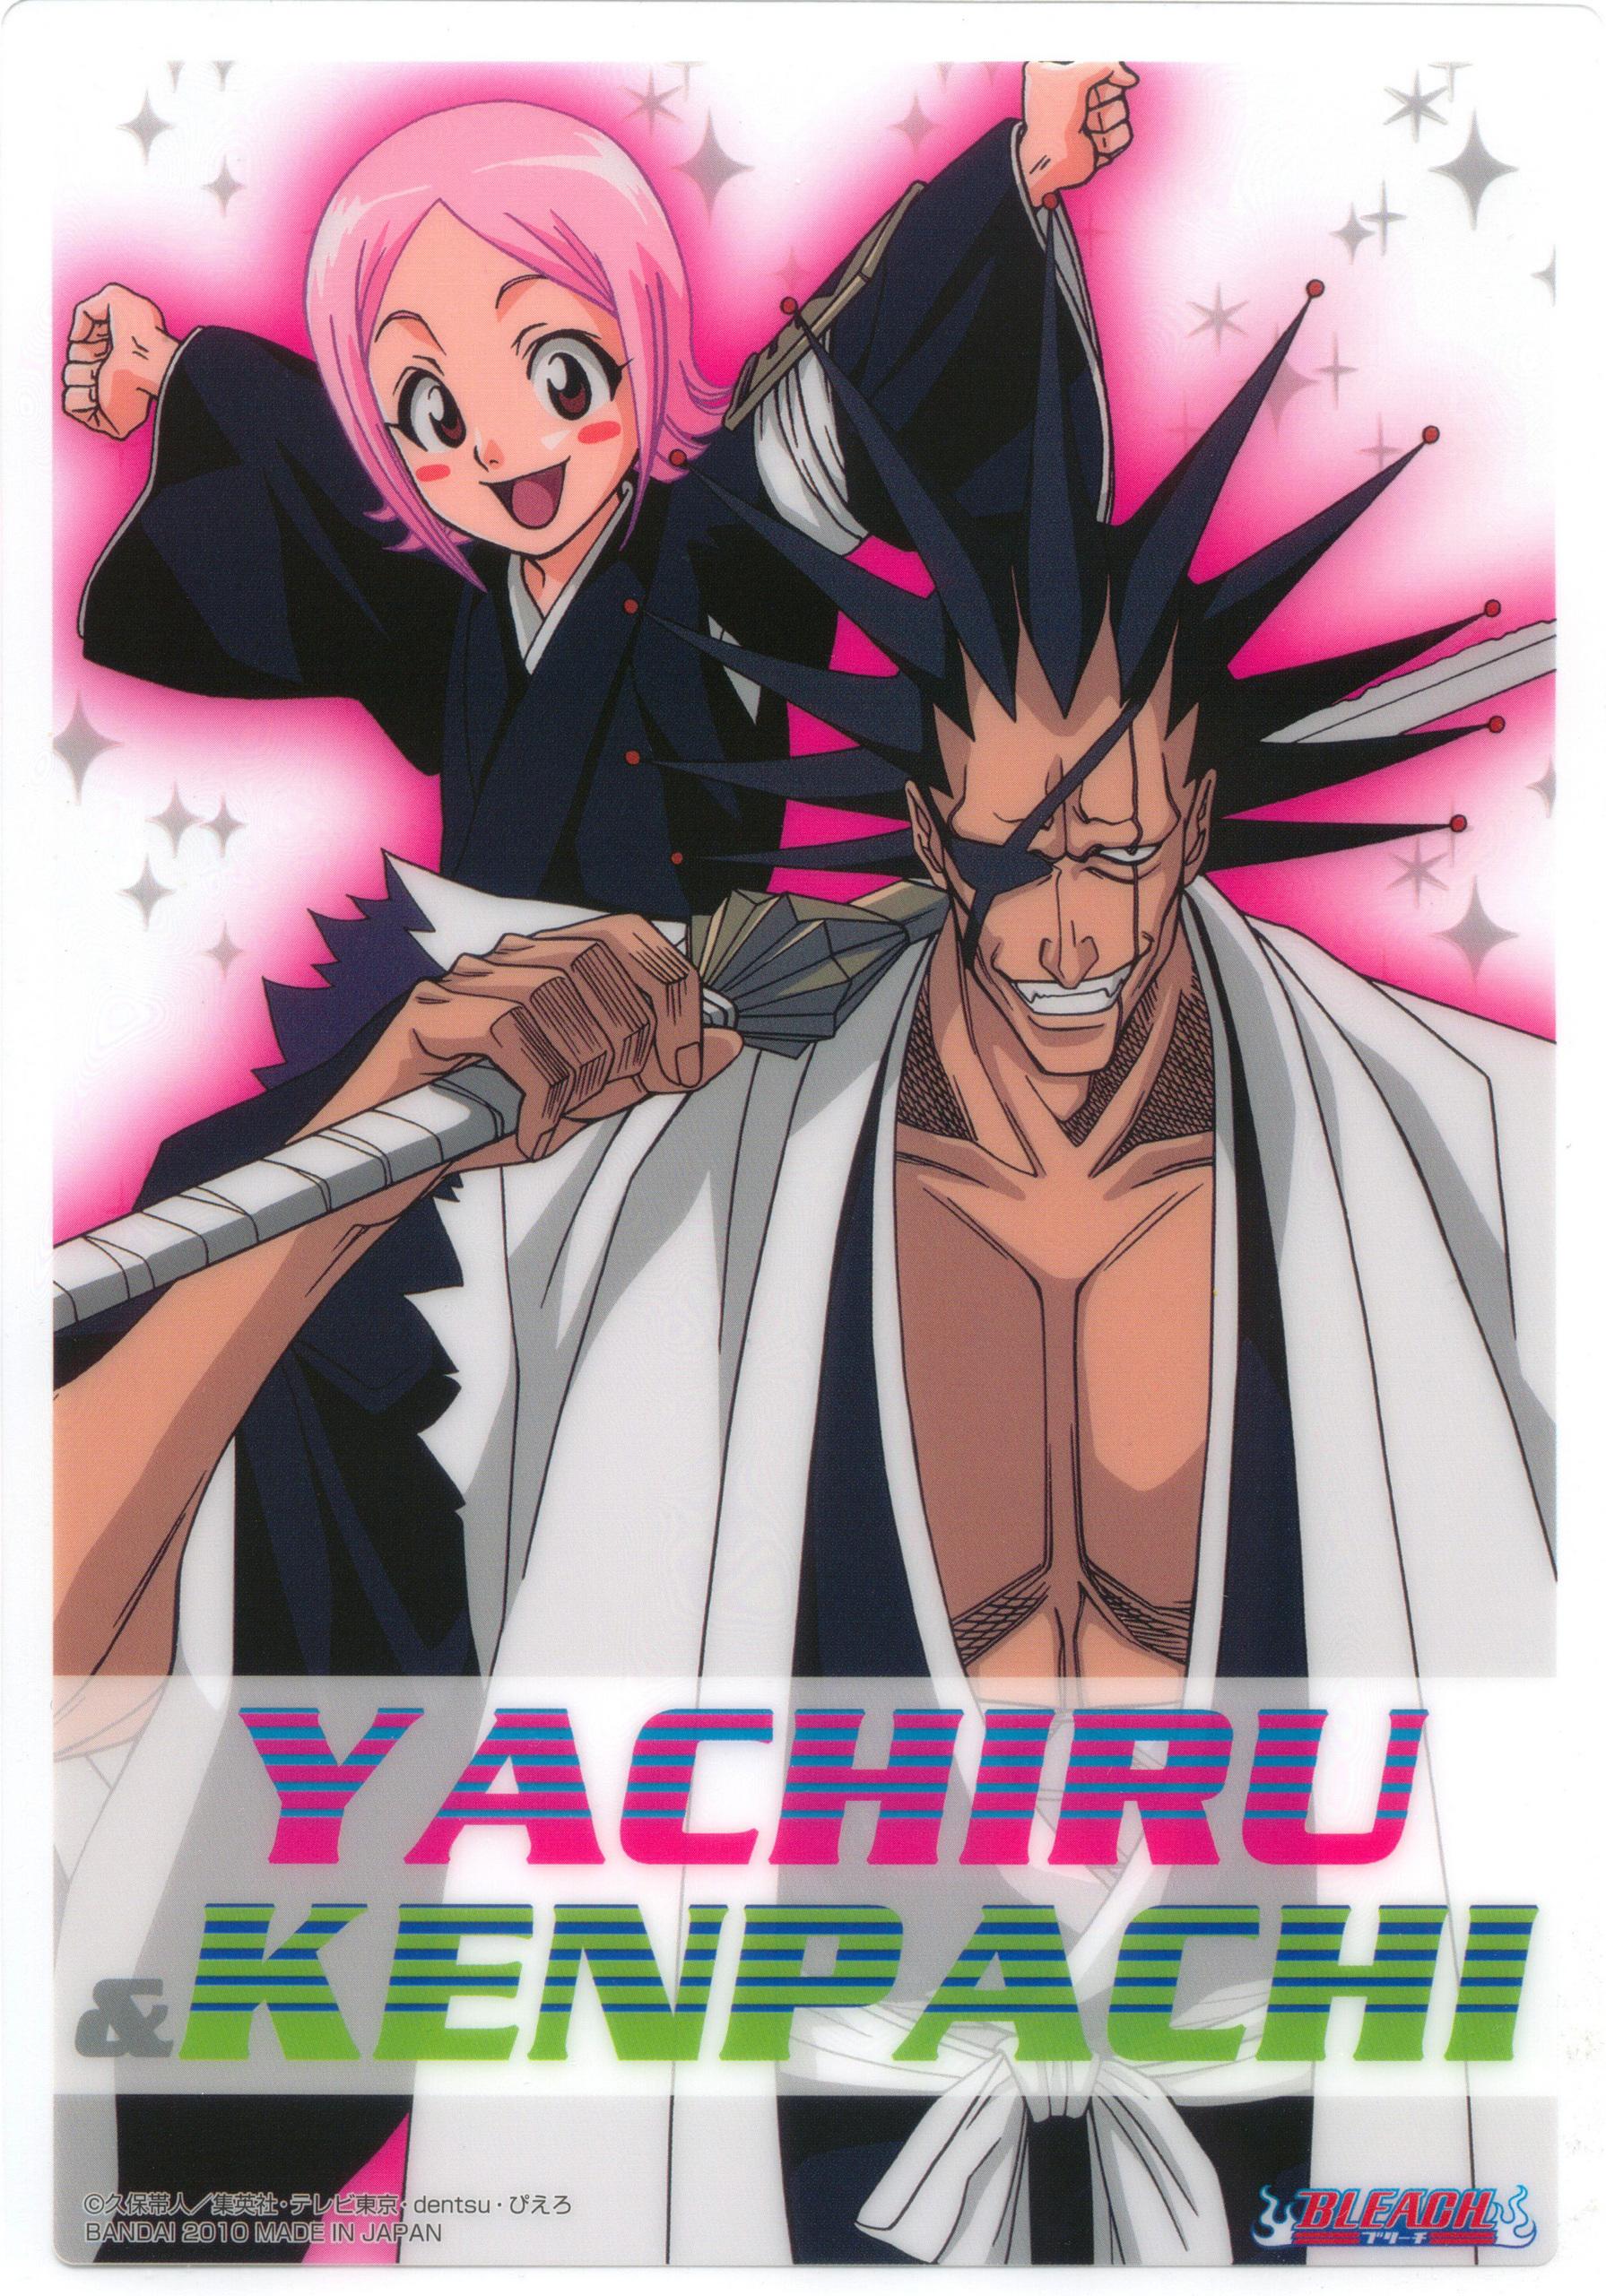 Zaraki Kenpachi Images Yachiru Zaraki Hd Wallpaper And